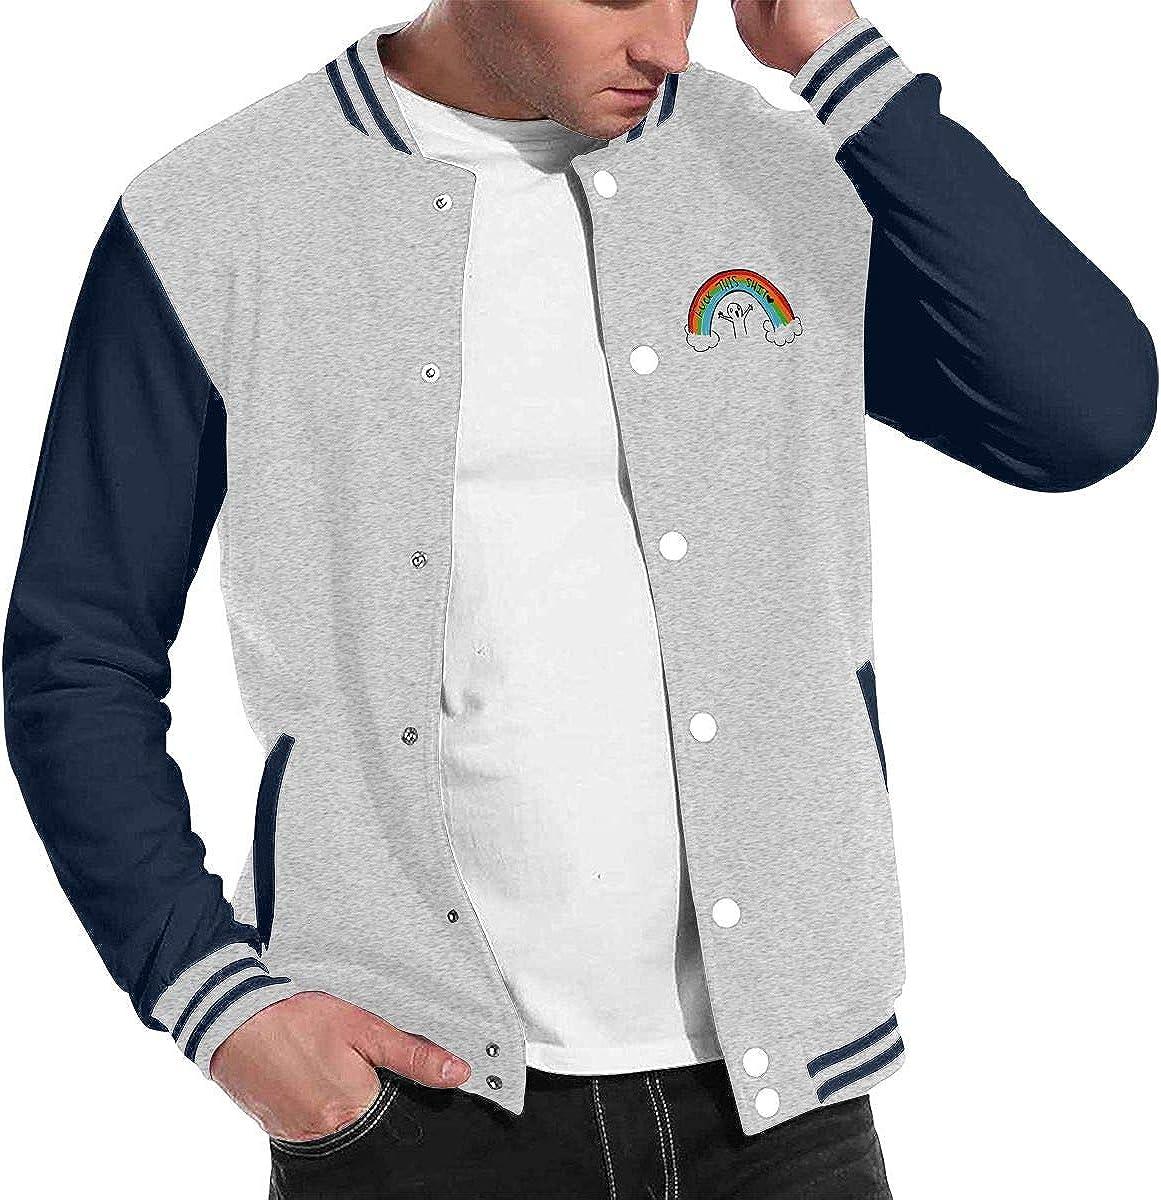 JJKKFG-H Zero Fucks Given Mens Fashion Baseball Uniform Jacket Sport Coat